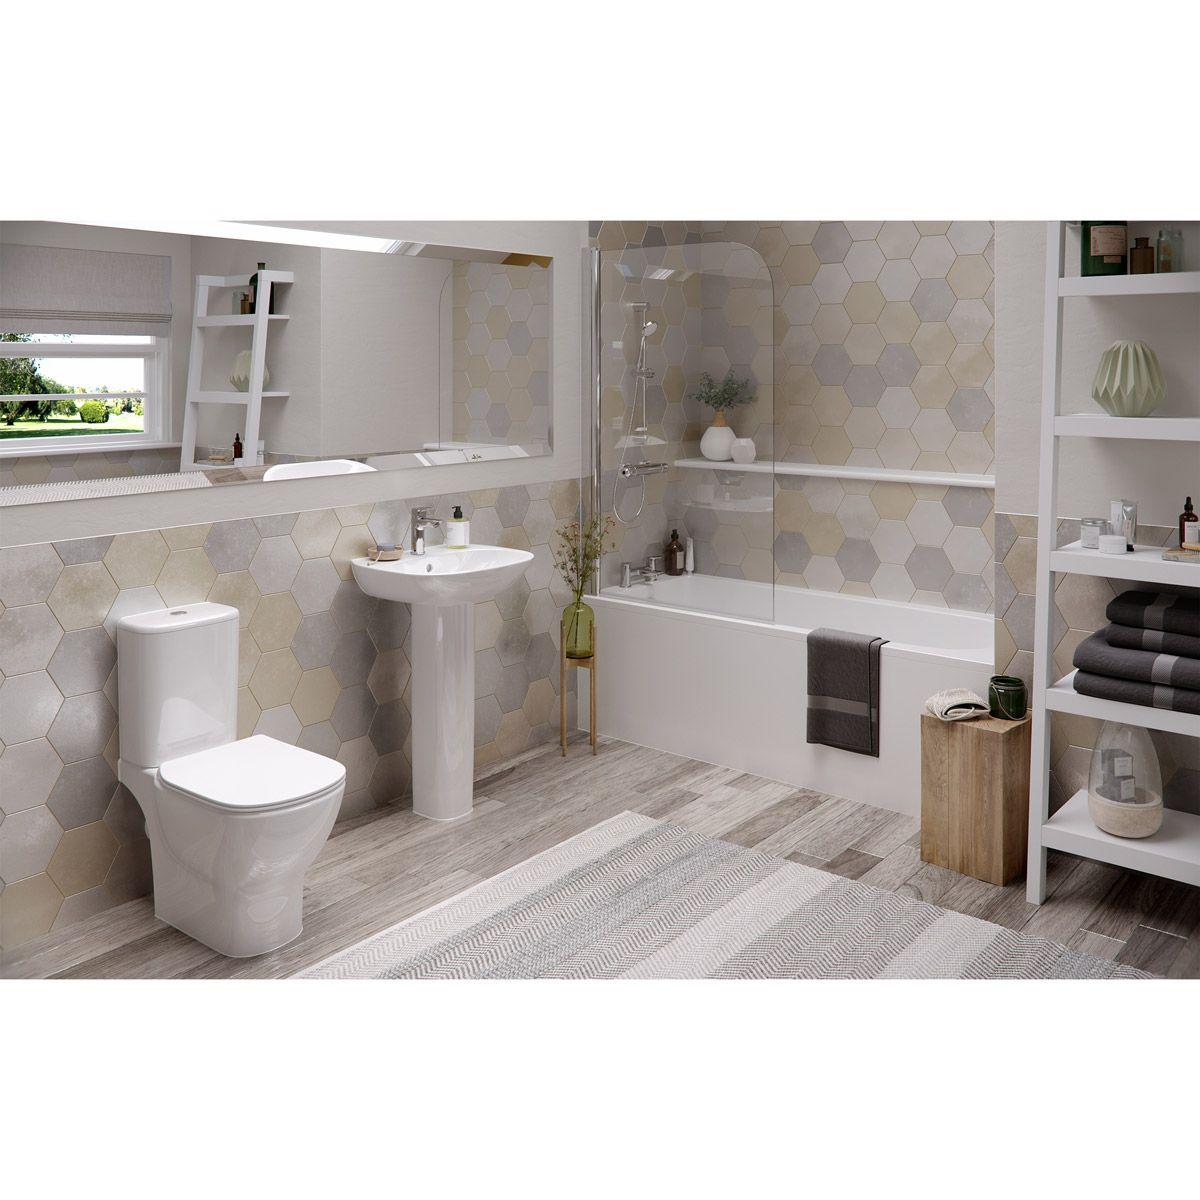 Ideal Standard Tesi Complete Bathroom Suite With Straight Bath Radius Bathscreen Taps Panel And Waste Straight Baths Complete Bathrooms Bathroom Suite